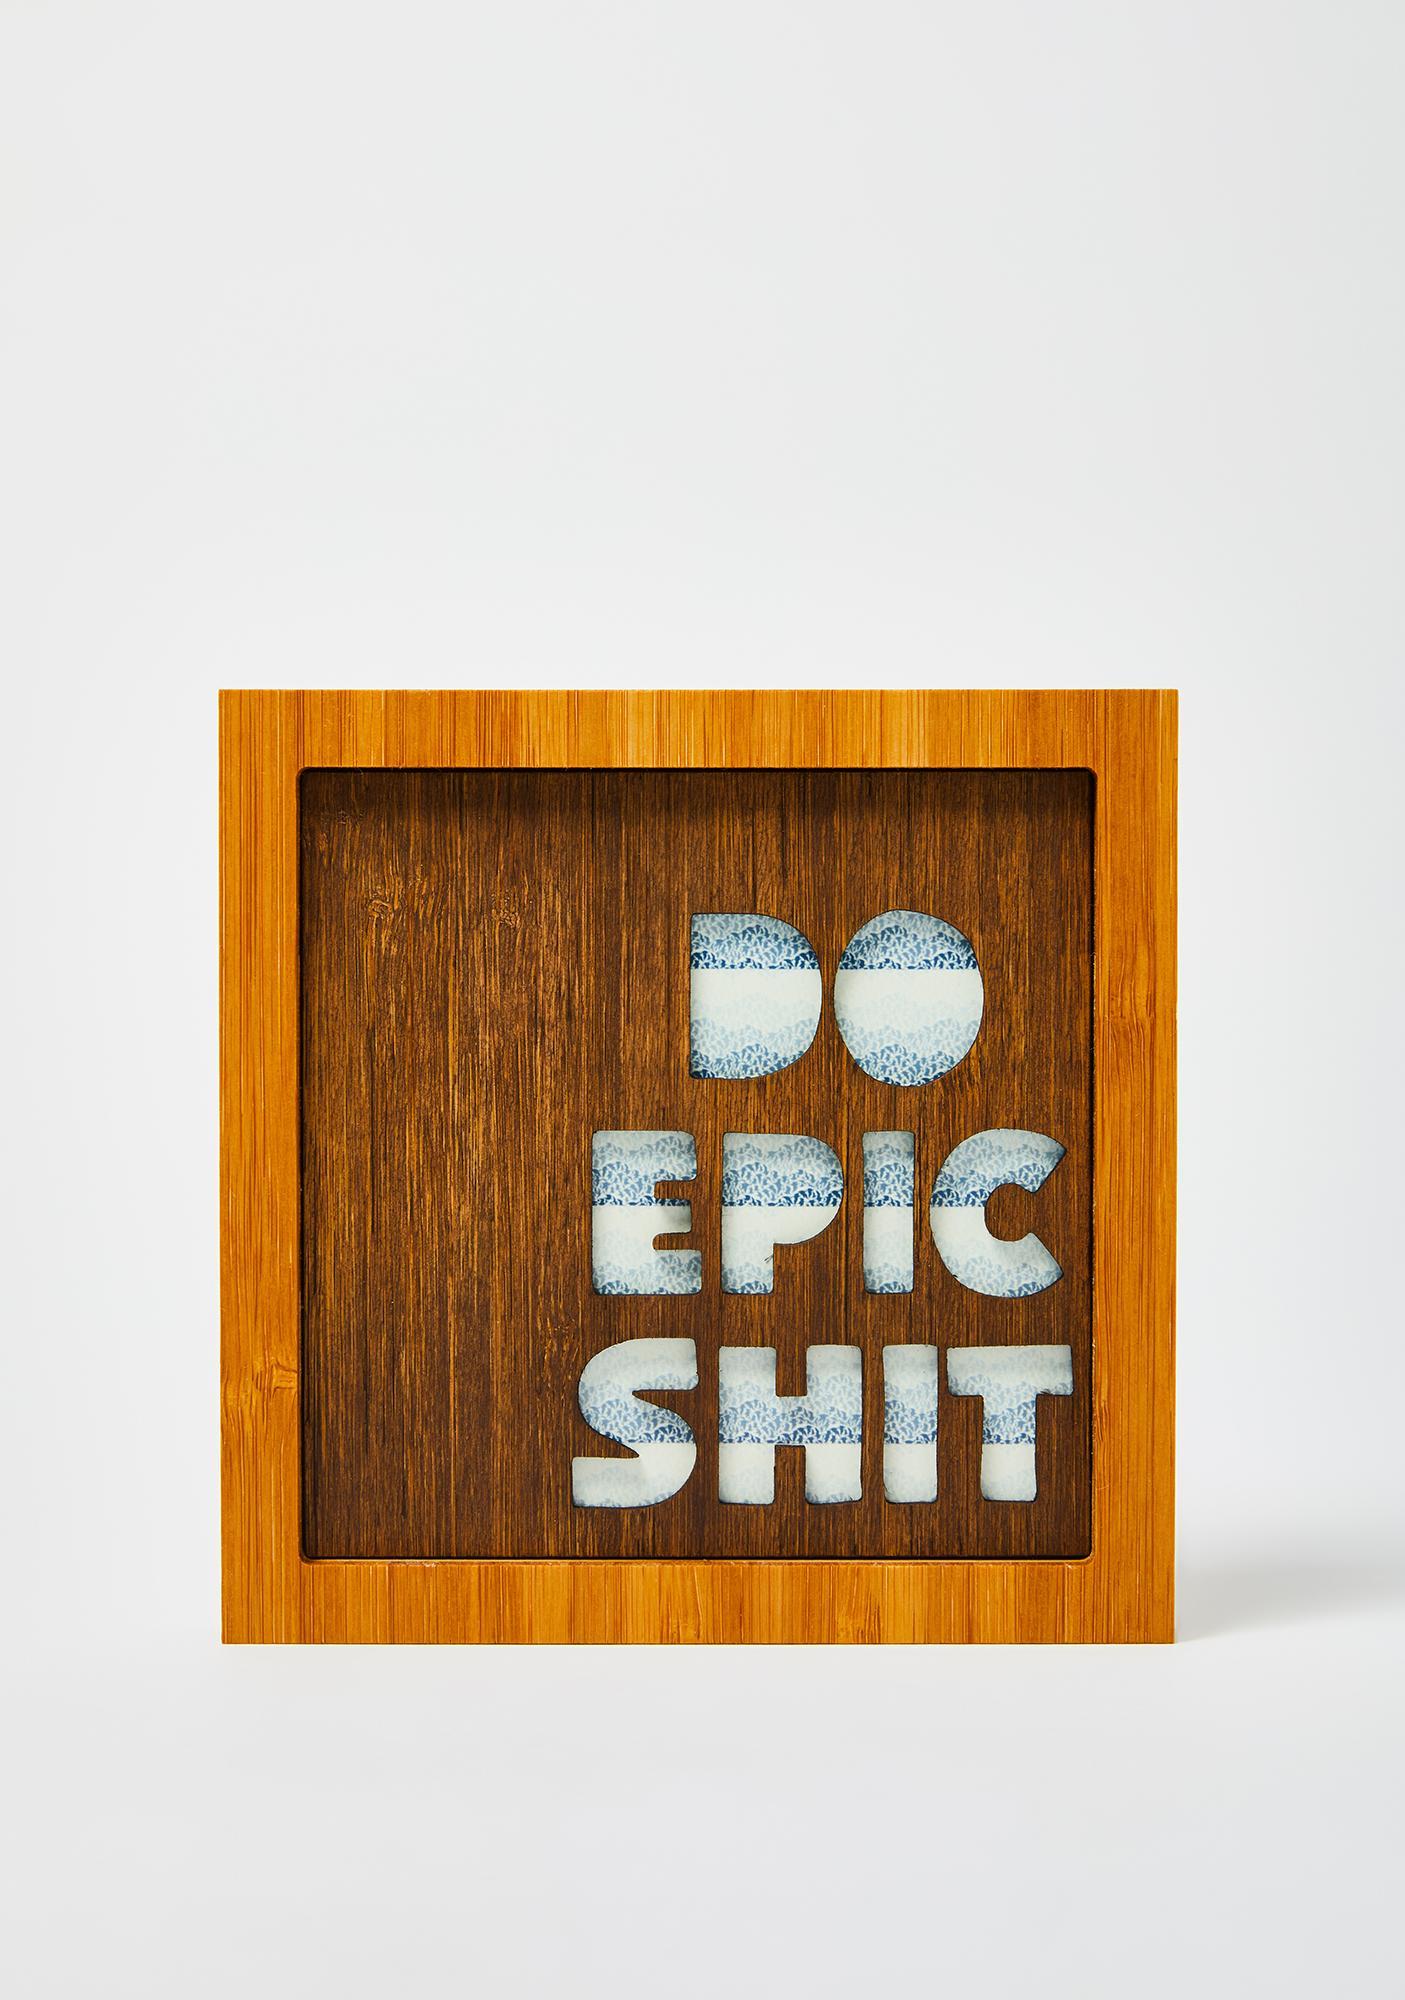 Citizen Ruth Do Epic Shit Bamboo Wall Art